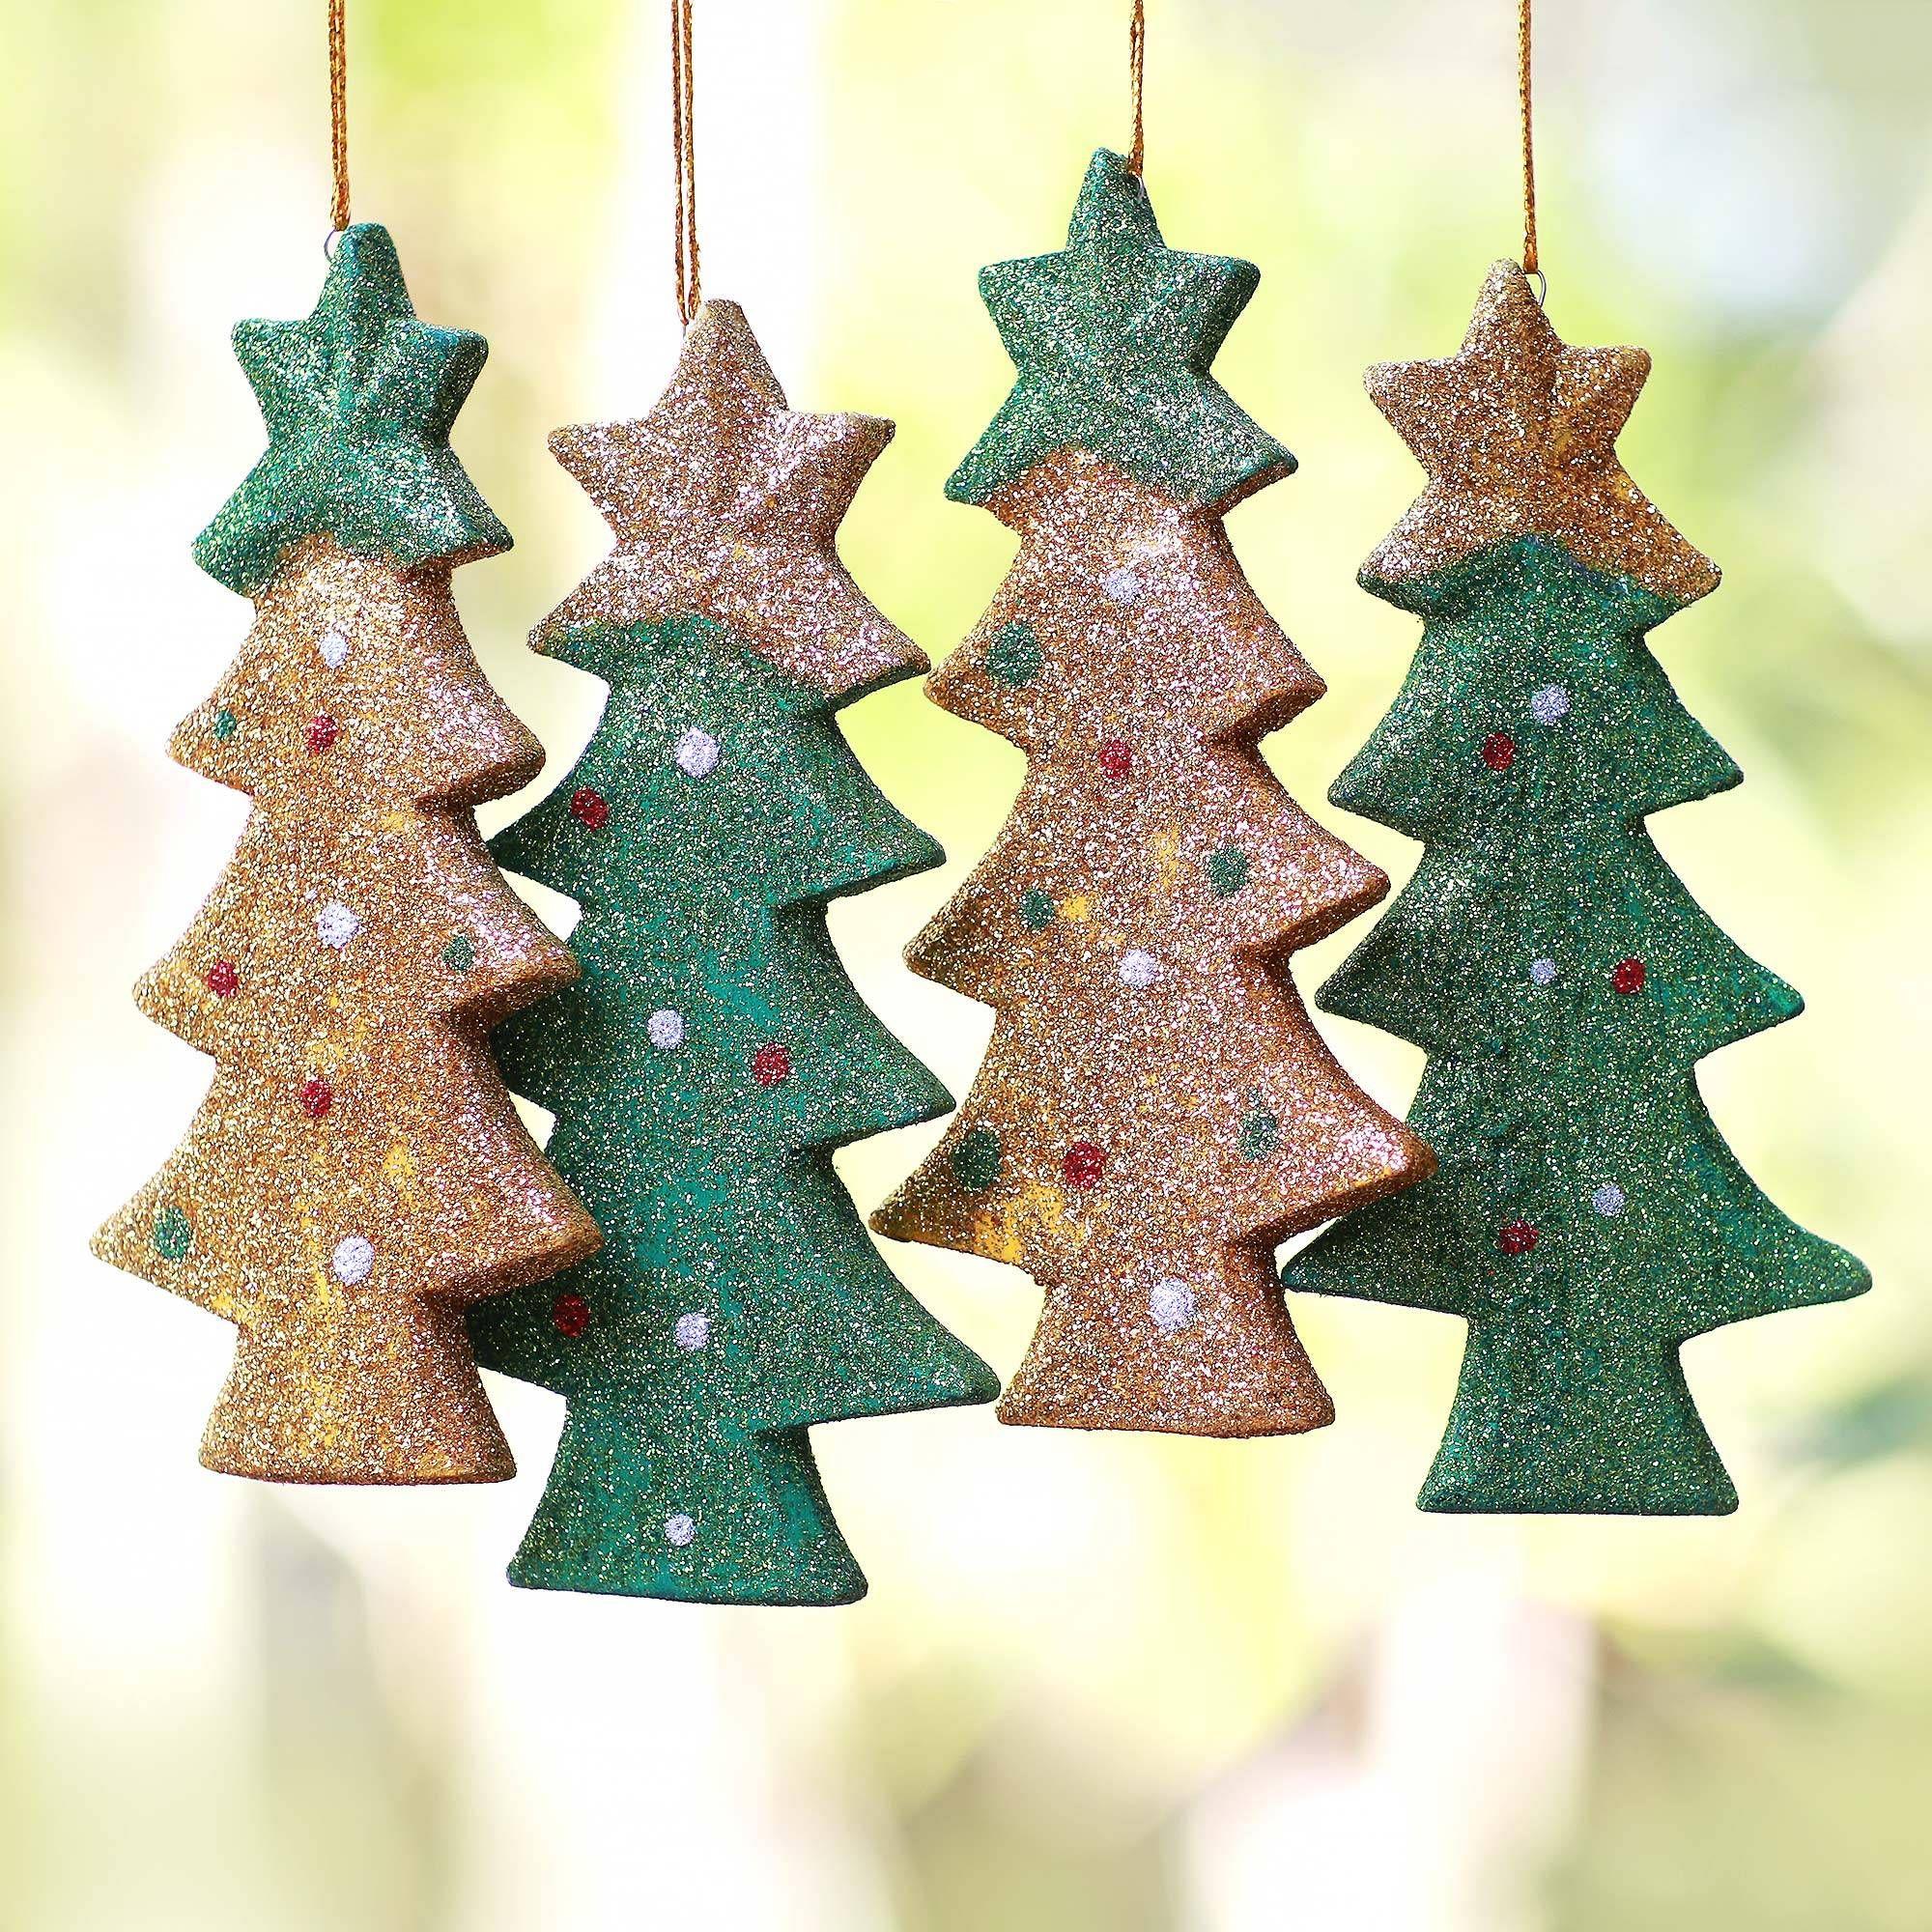 Wood Ornaments Sparkling Christmas Trees Set Of 4 In 2020 Christmas Tree Ornaments Wood Christmas Tree Christmas Ornaments To Make